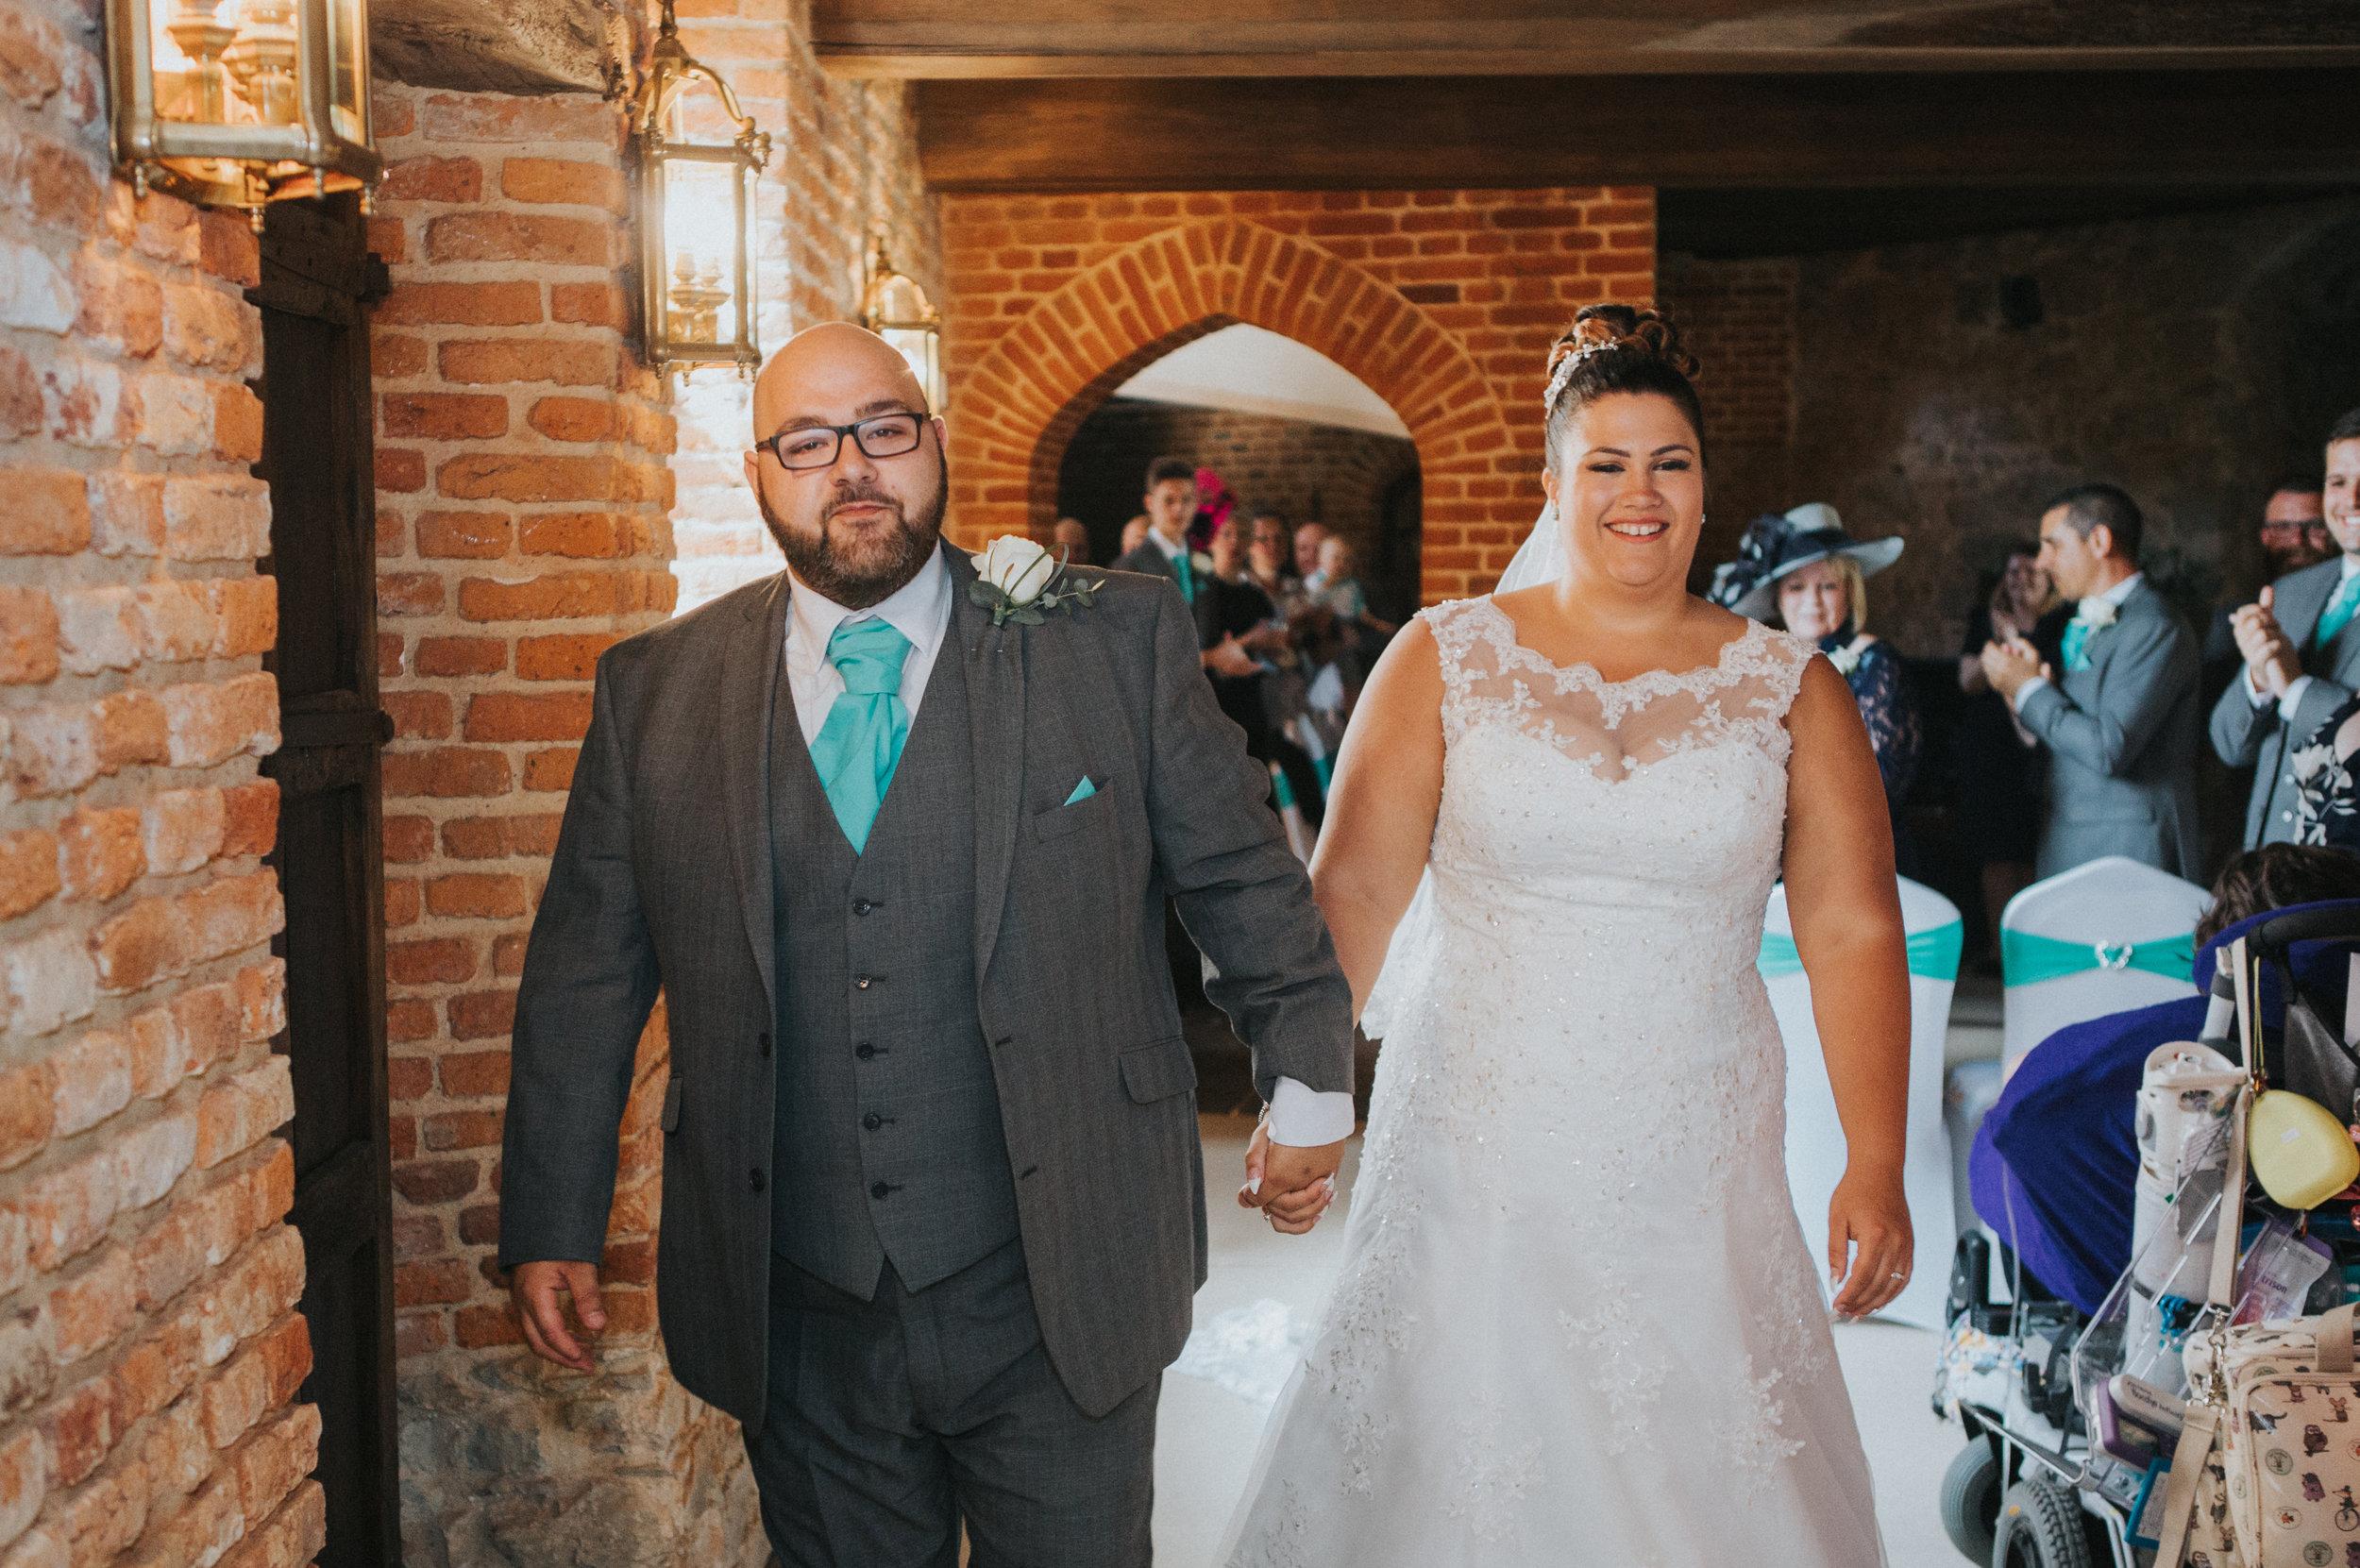 westenhangar-castle-kent-london-wedding-photography-43